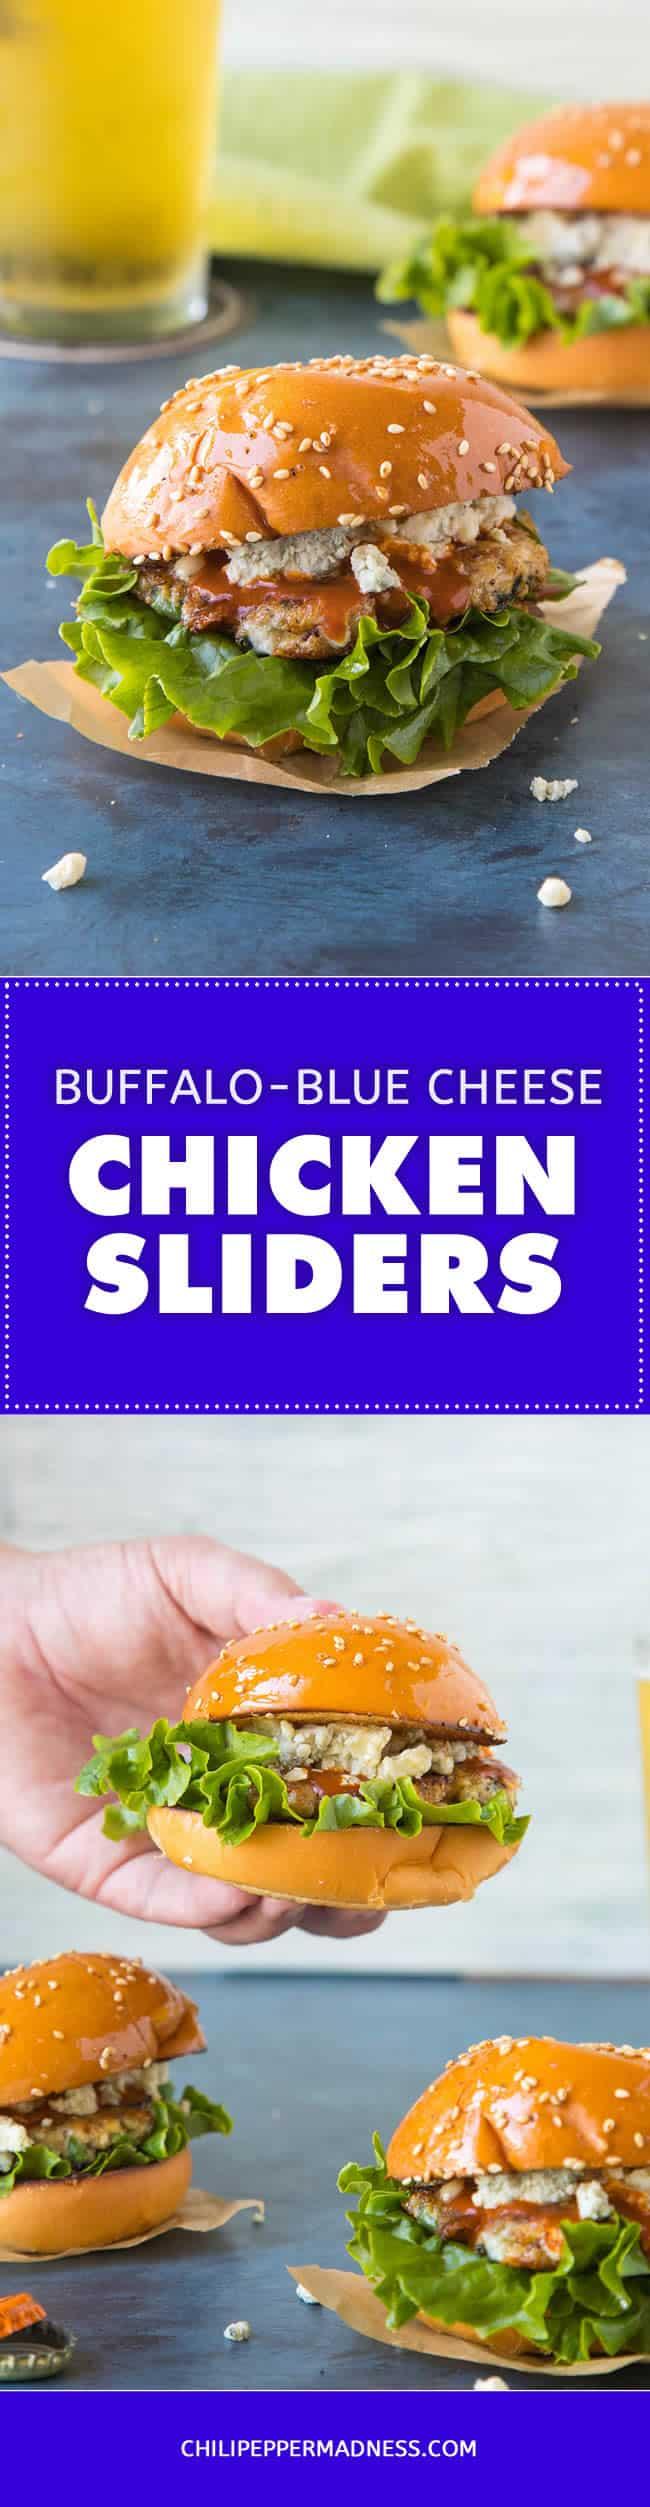 Buffalo Blue Cheese Chicken Sliders - Recipe | ChiliPepperMadness.com #sliders #appetizer #burger #chickenslider #chickenburger #gameday #partyfood